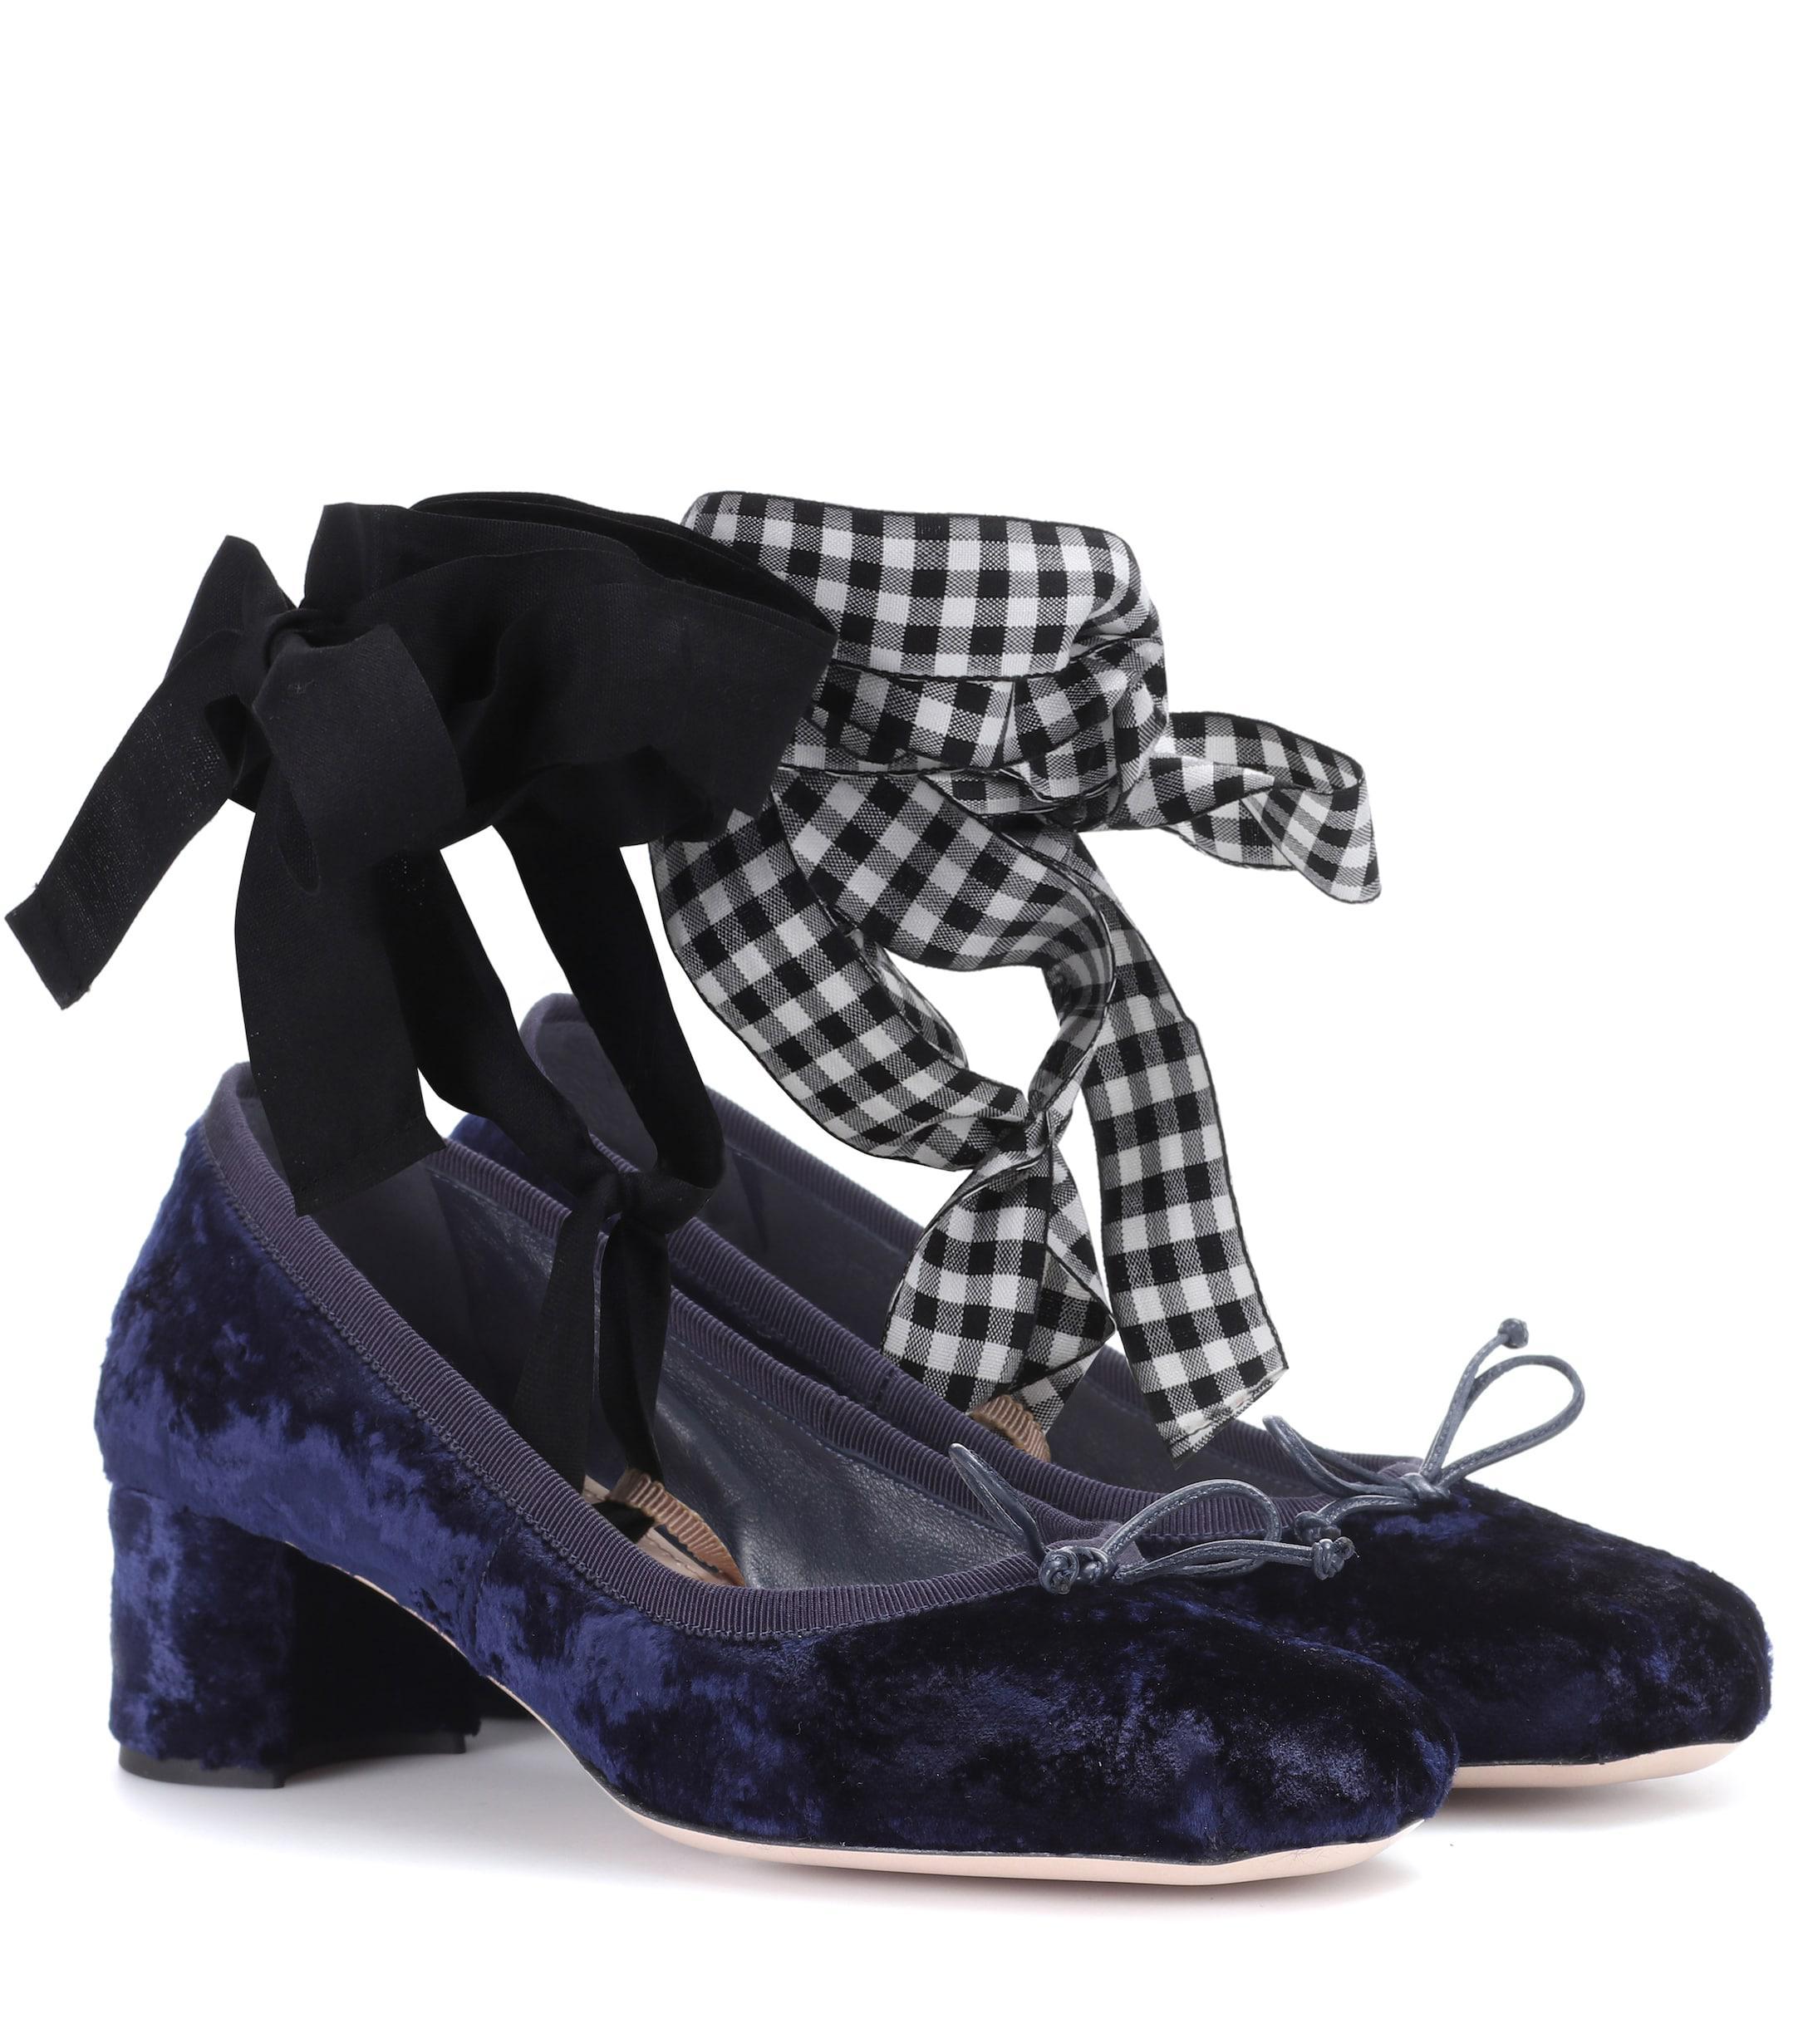 301d9af4e35 Lyst - Miu Miu Velvet Ballerina Pumps in Blue